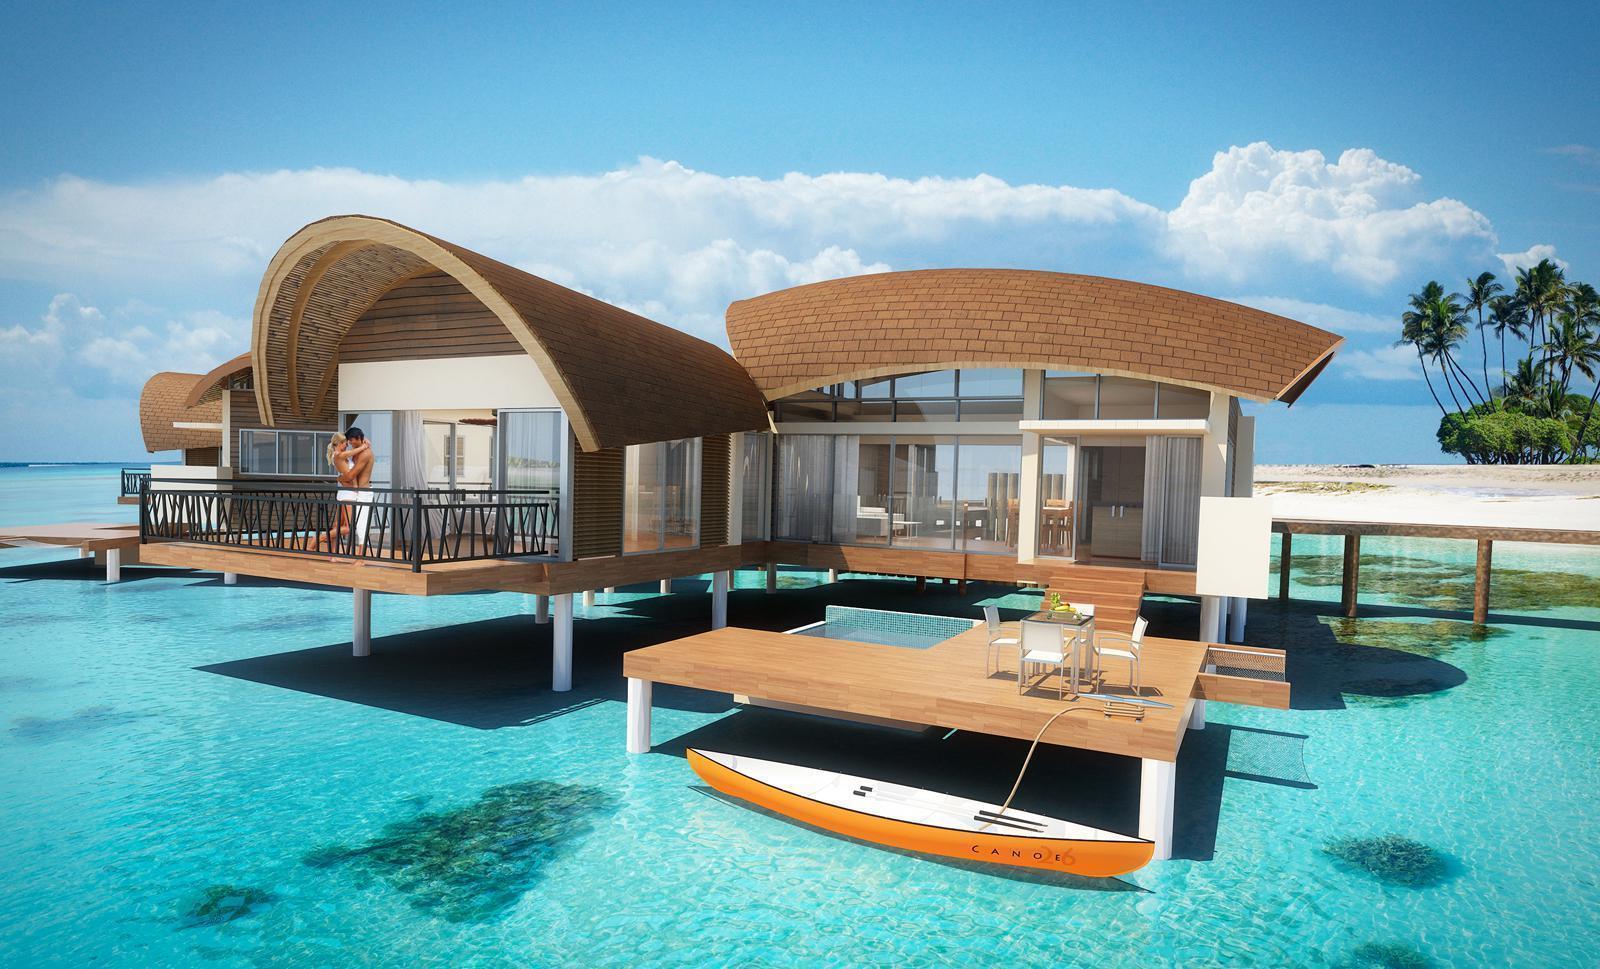 Amazingpict com beach bungalow hd wallpaper for iphone